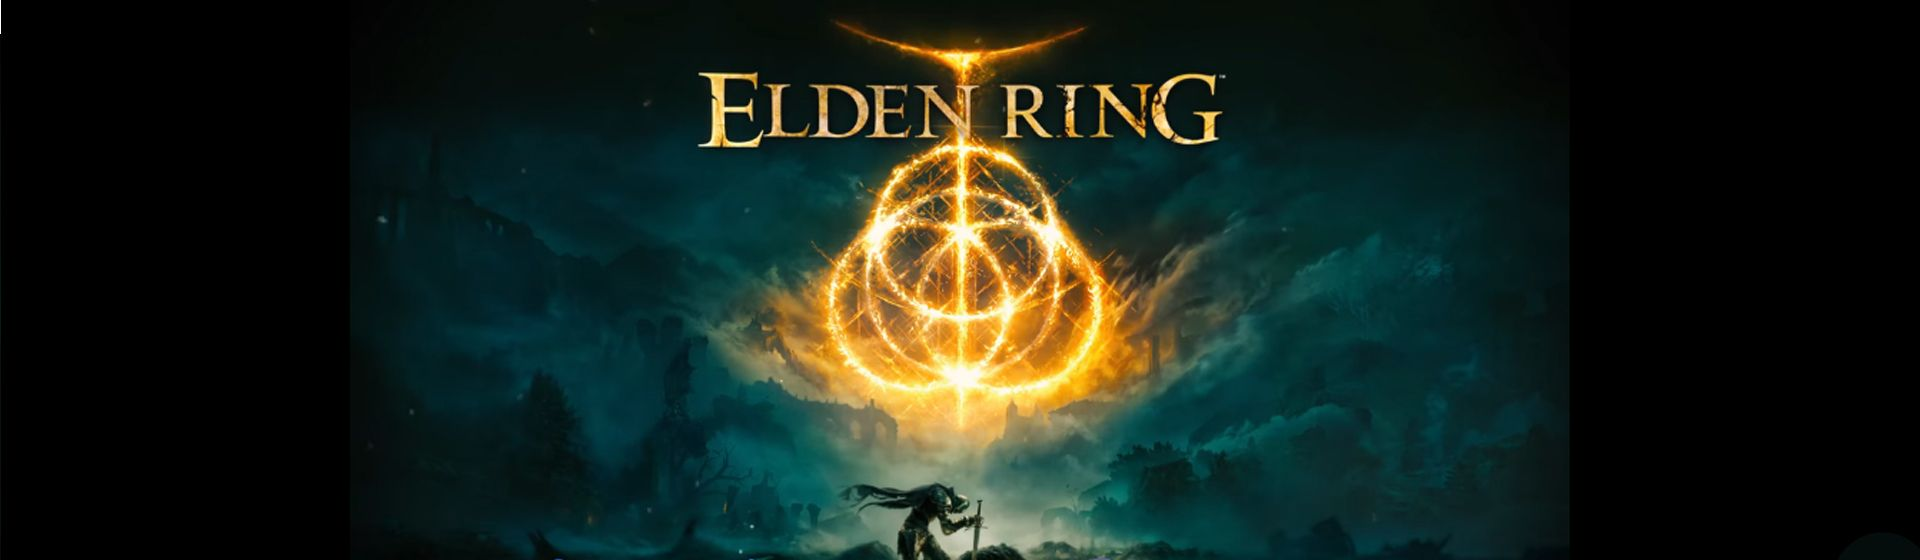 Elden Ring: tudo o que sabemos sobre o novo game até aqui